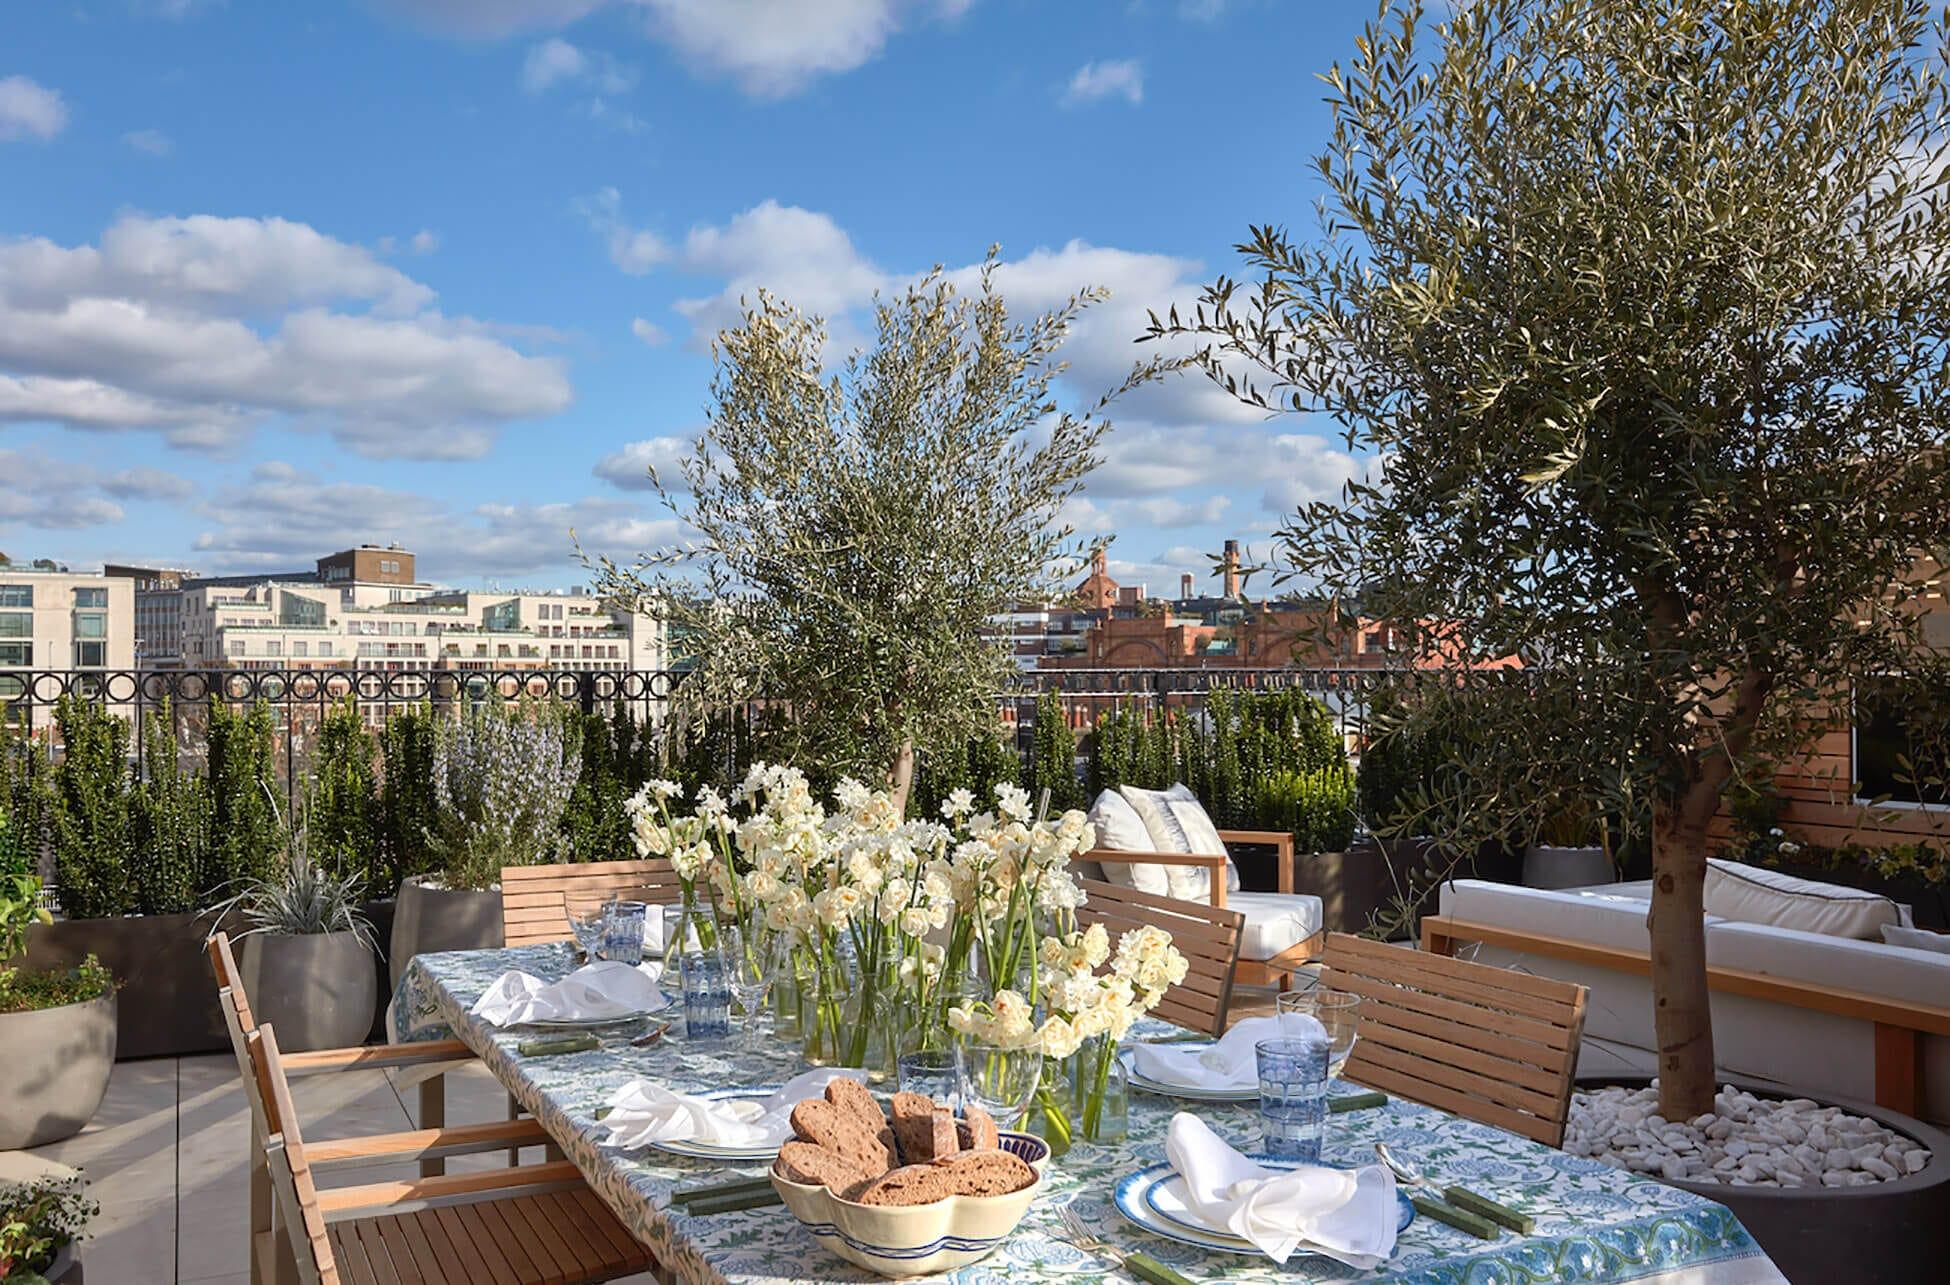 Balcony shot of kensington luxury interior design project